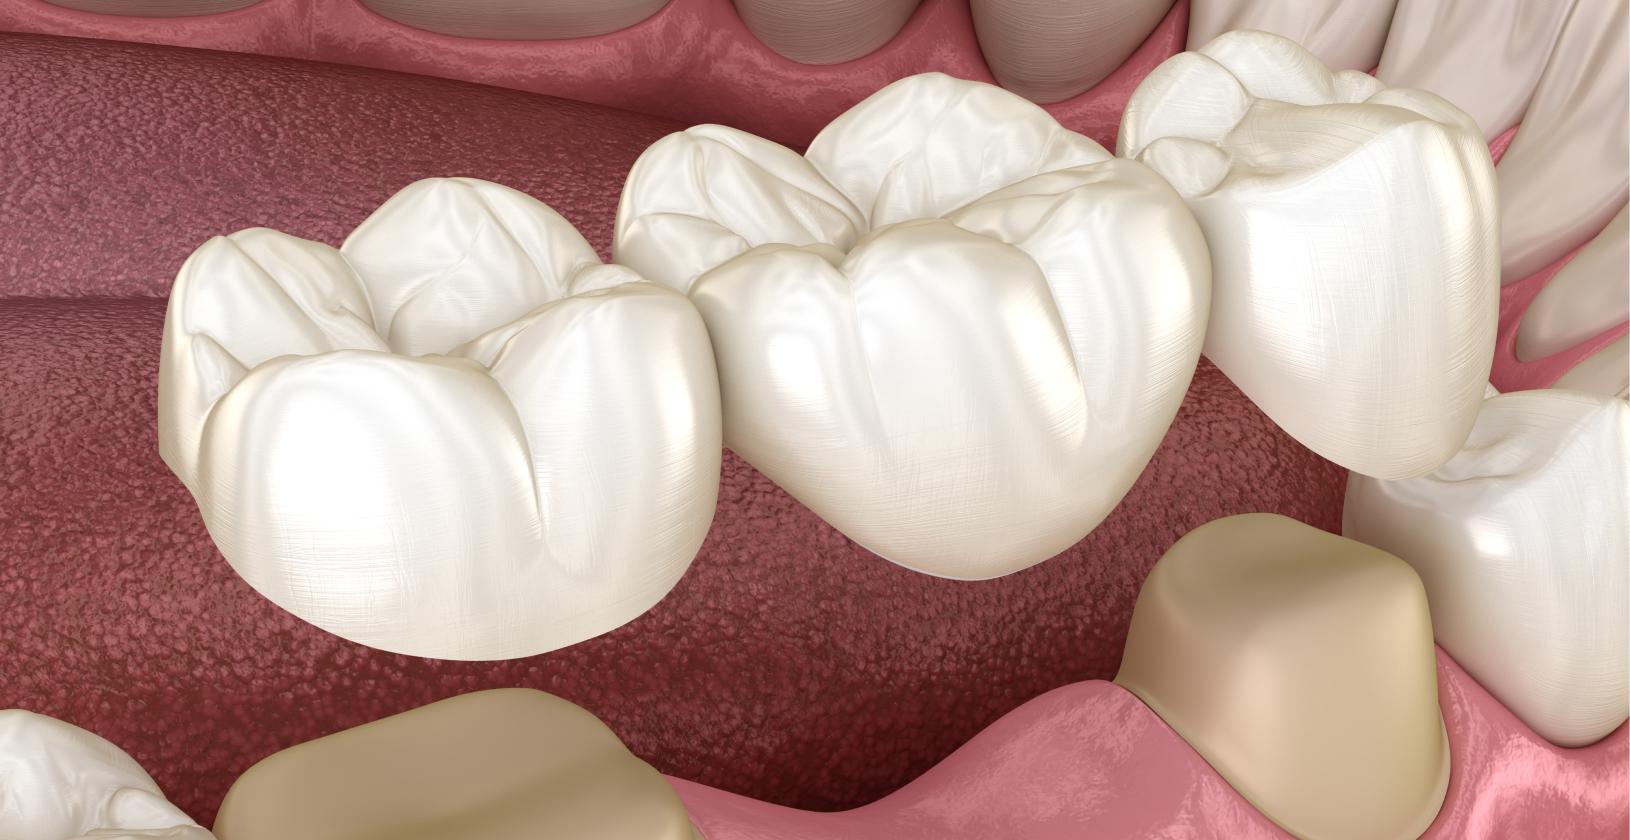 Tandara Dental Bridges A Complete Overview